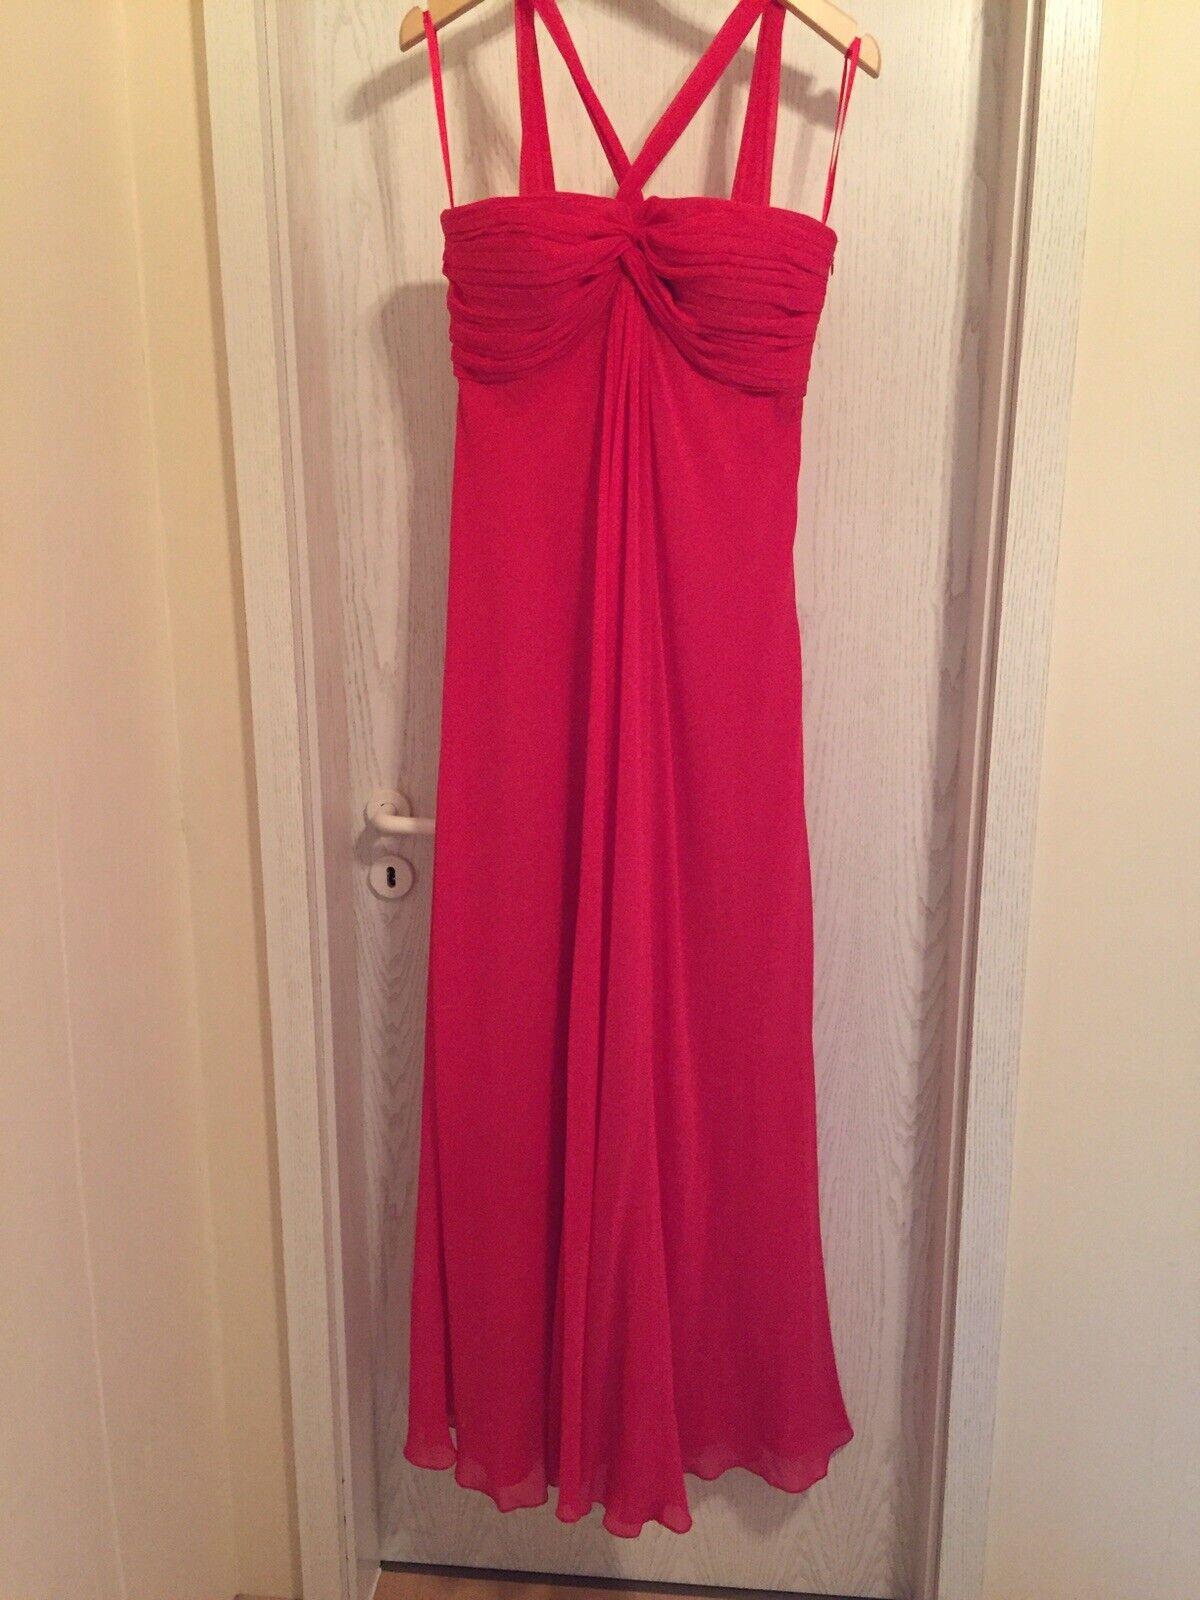 Jake's Damen Kleid Abendkleid Cocktailkleid Maxi-Dress Gr. 40 40 40 - NEU- eea528